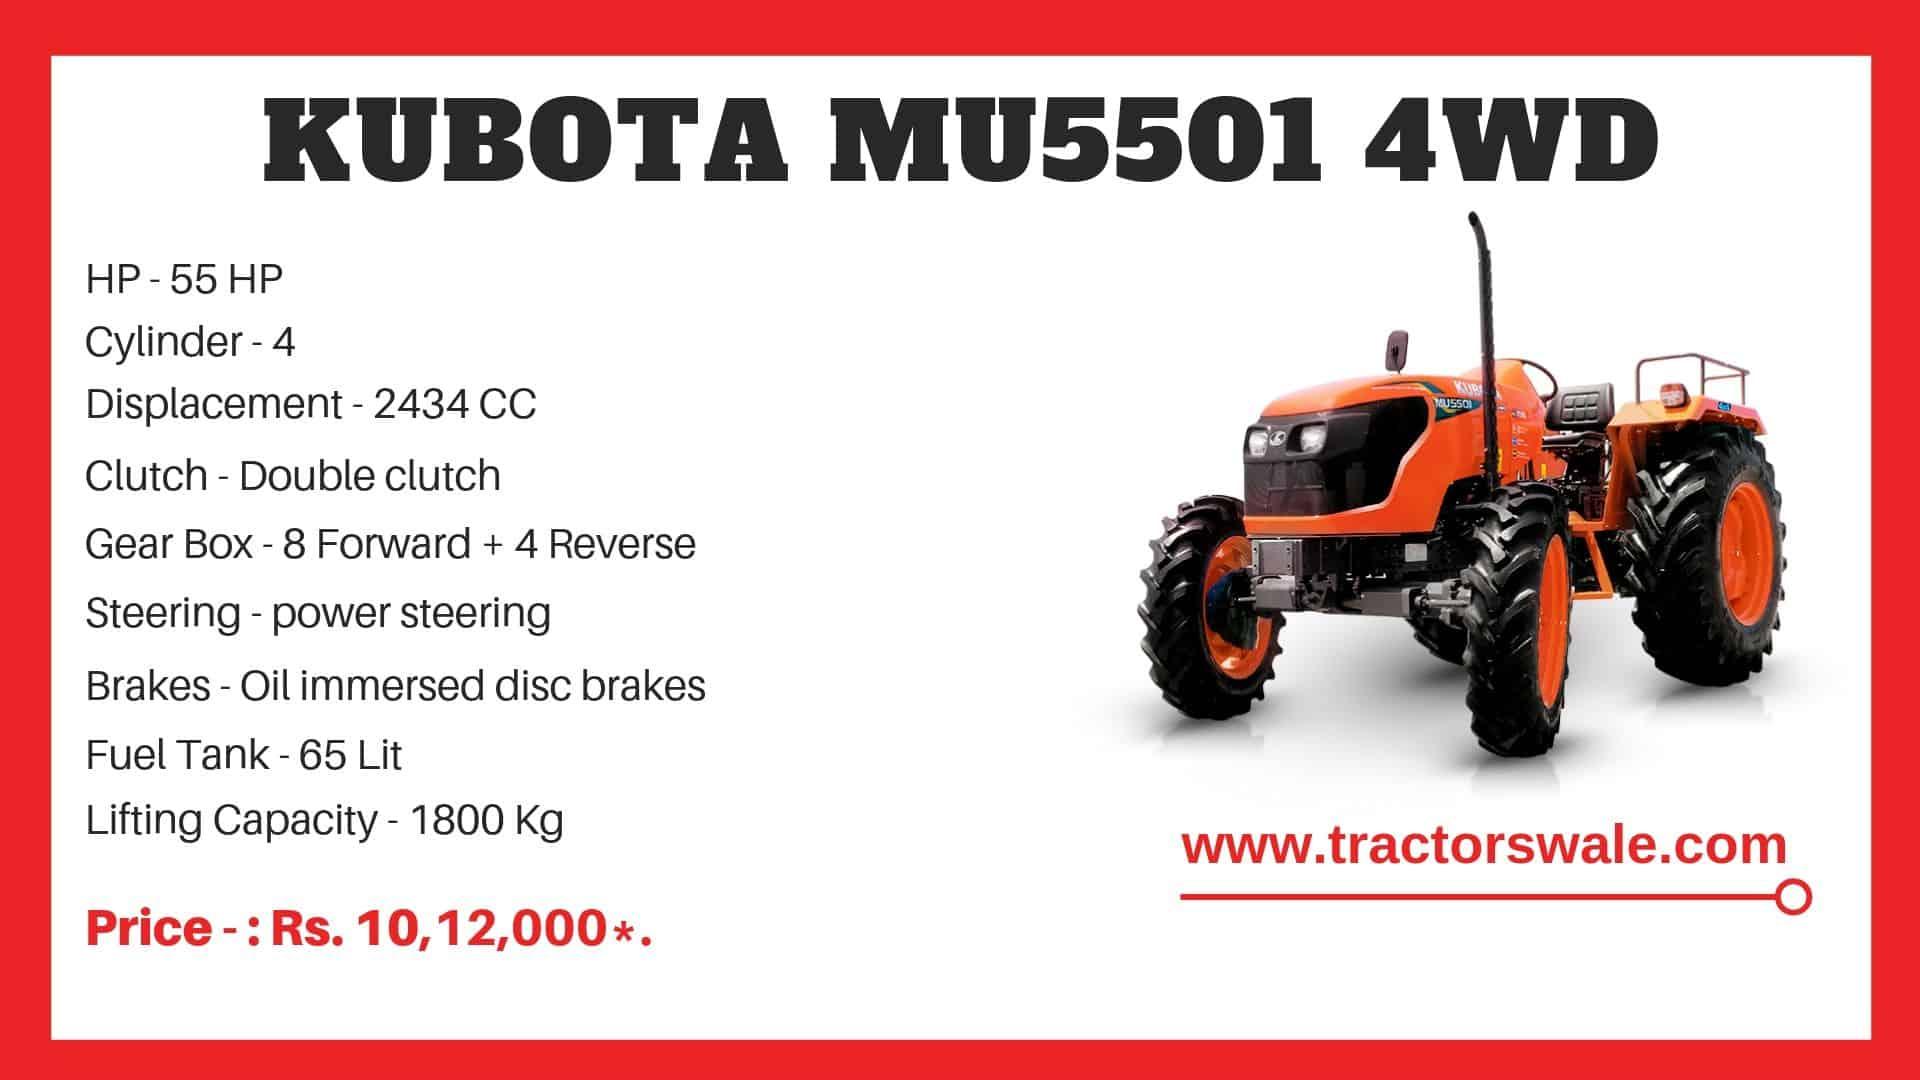 Specification of Kubota MU5501 4WD